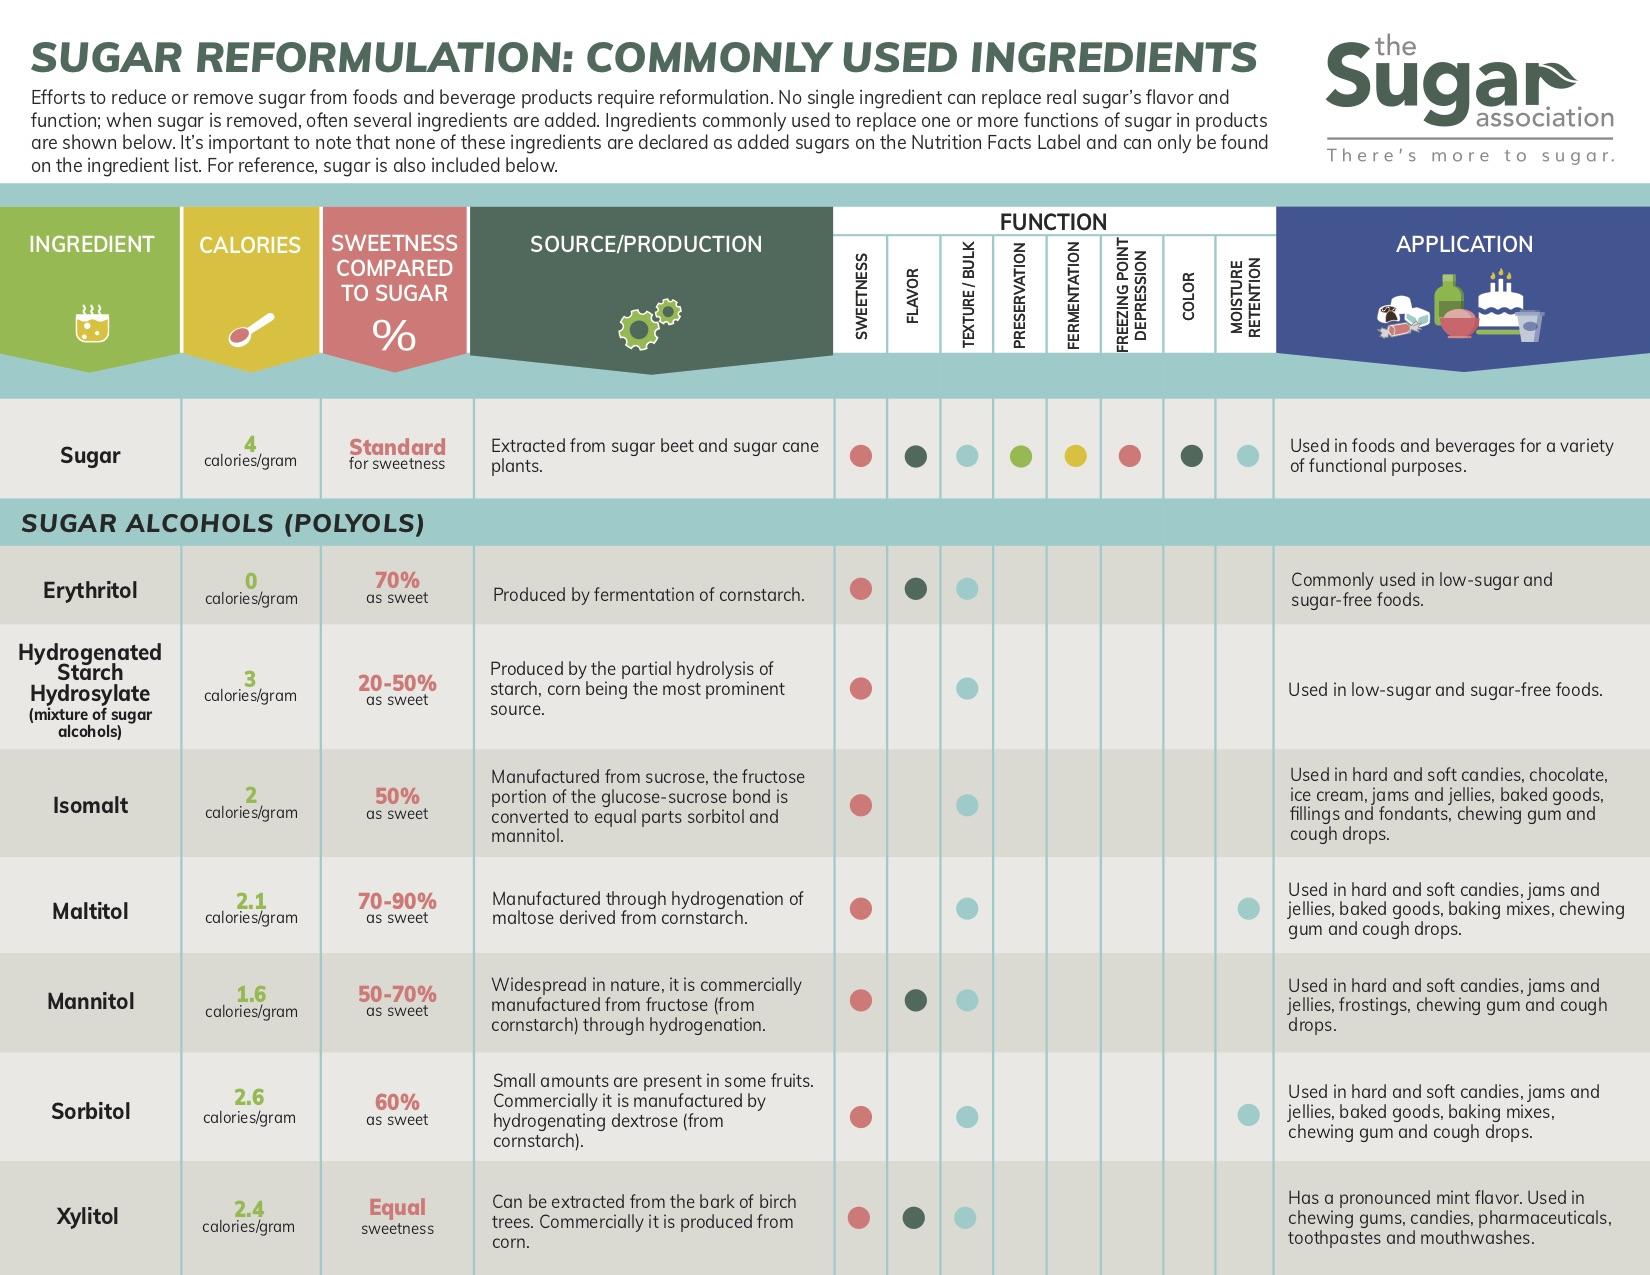 Sugar Reformulation: Commonly Used Ingredients